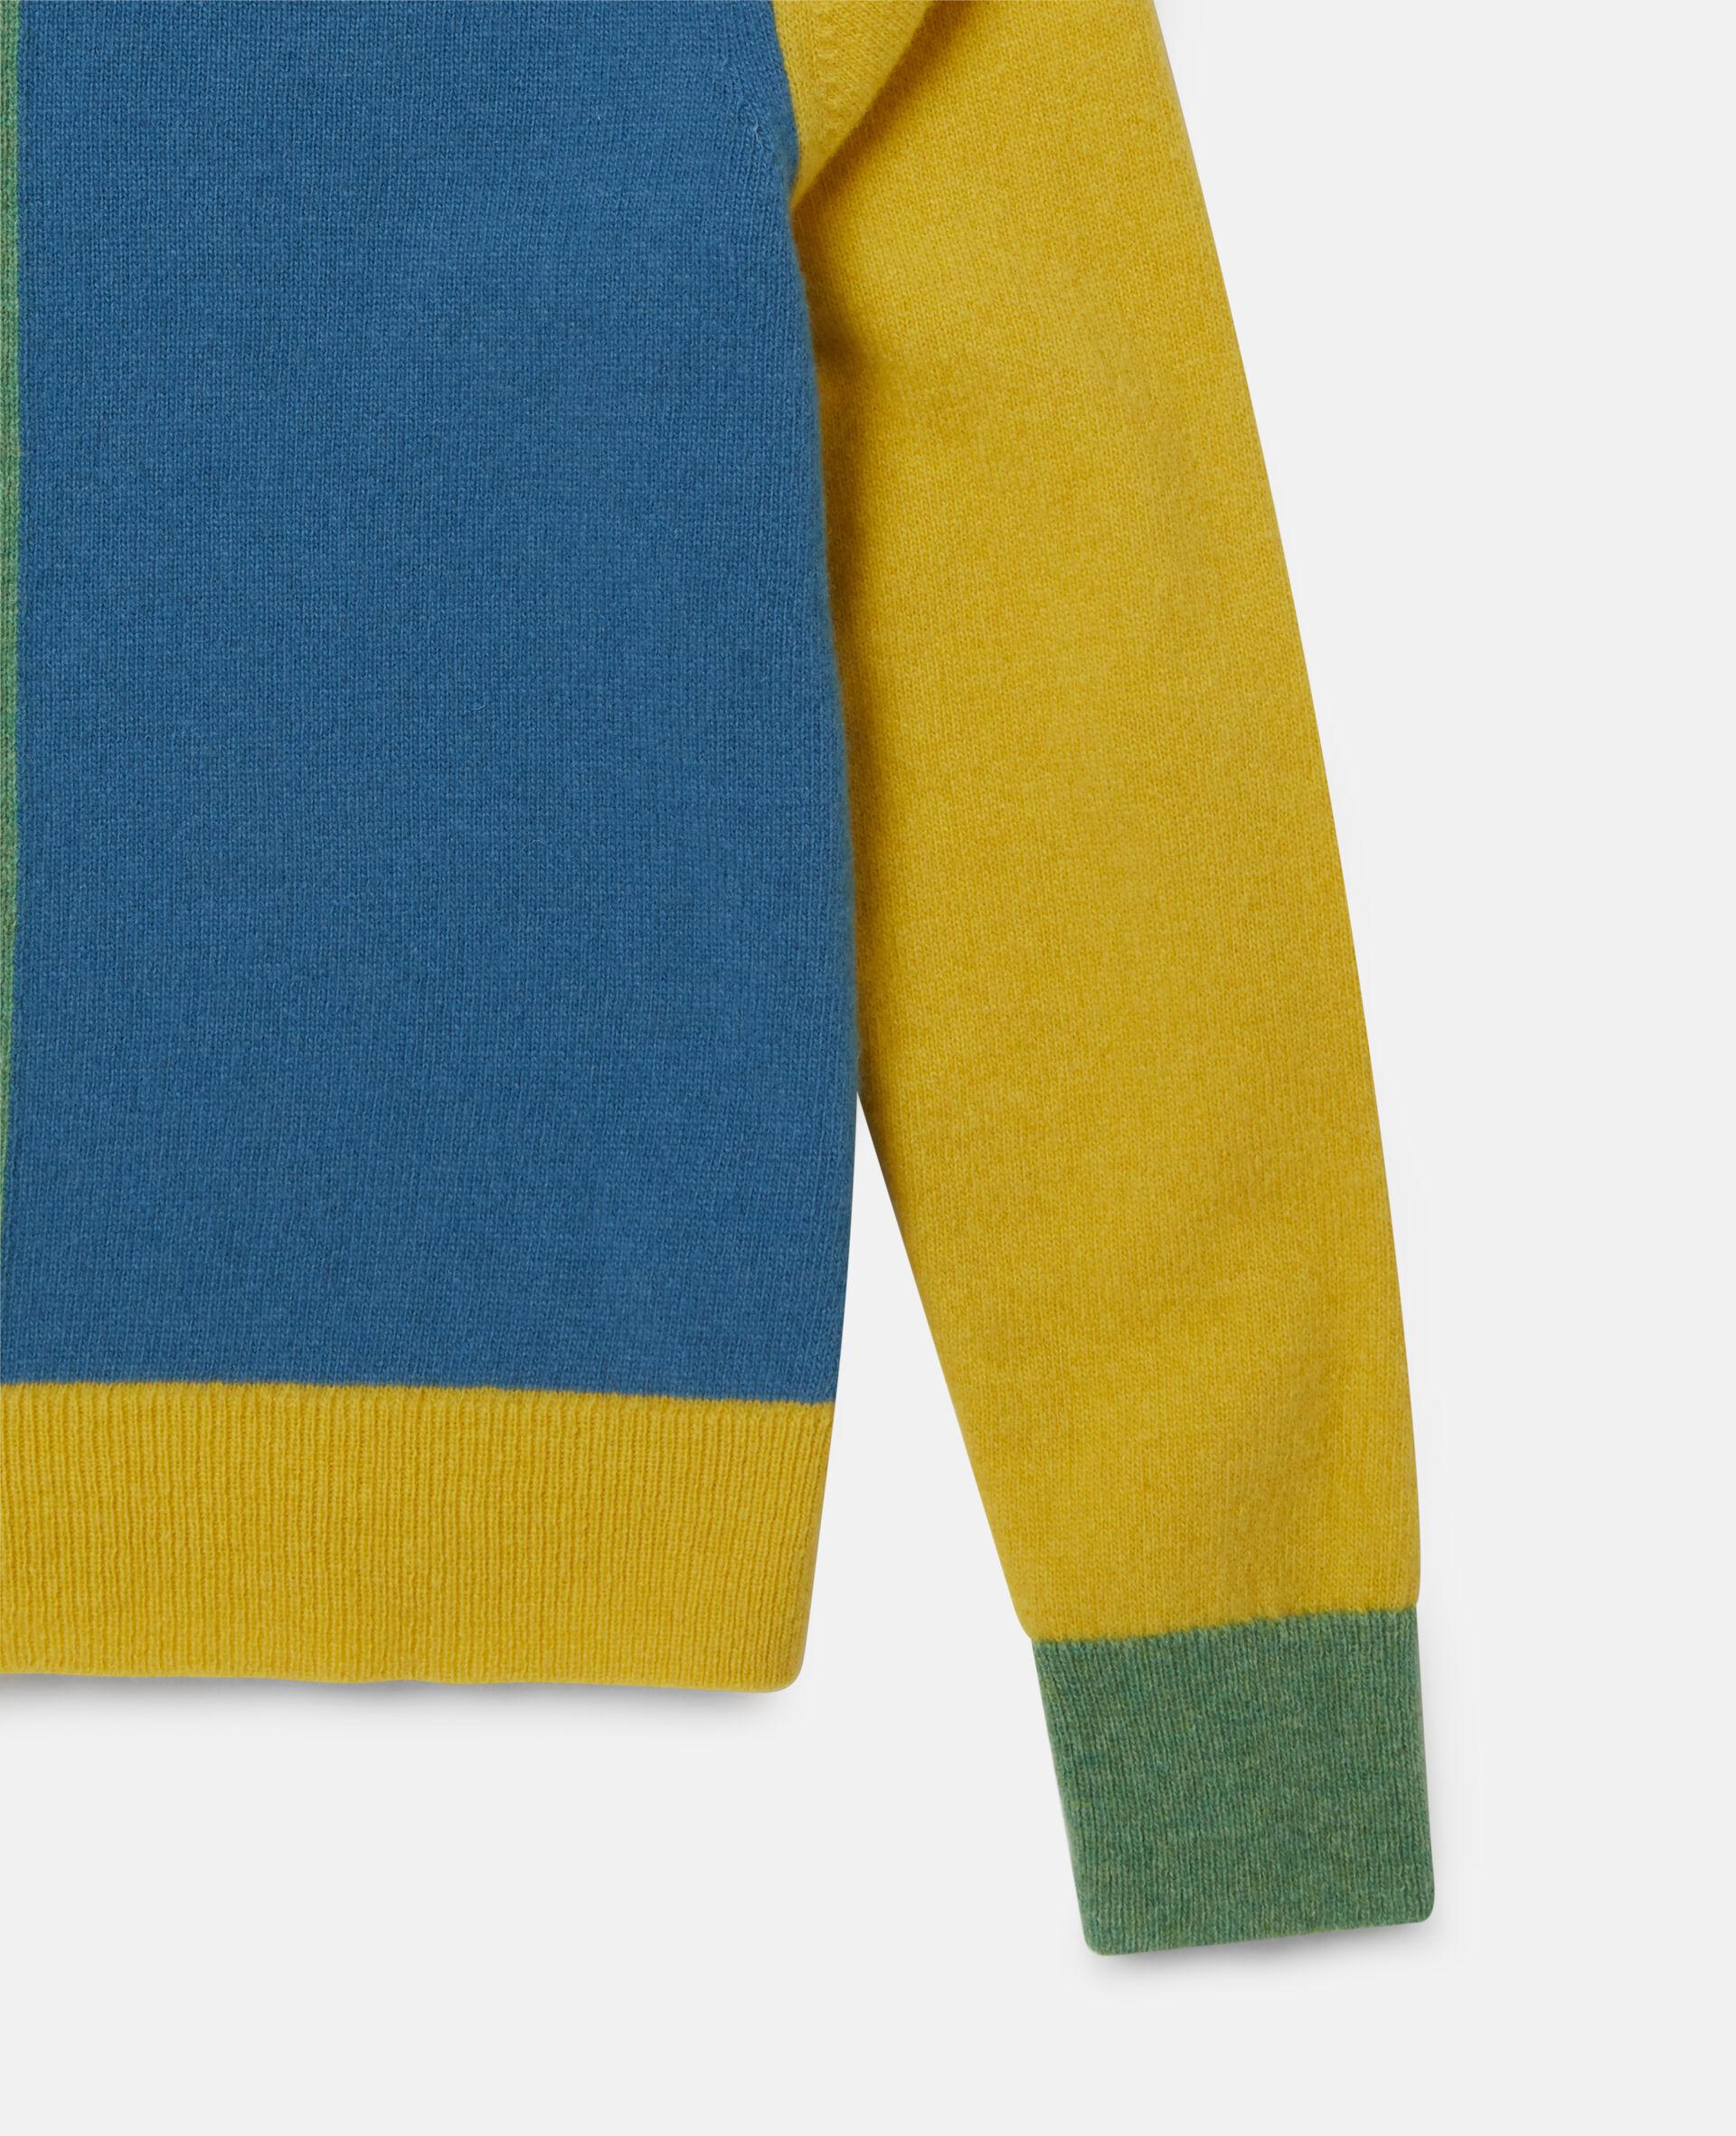 Colourblock Knit Intarsia Jumper -Multicolour-large image number 2